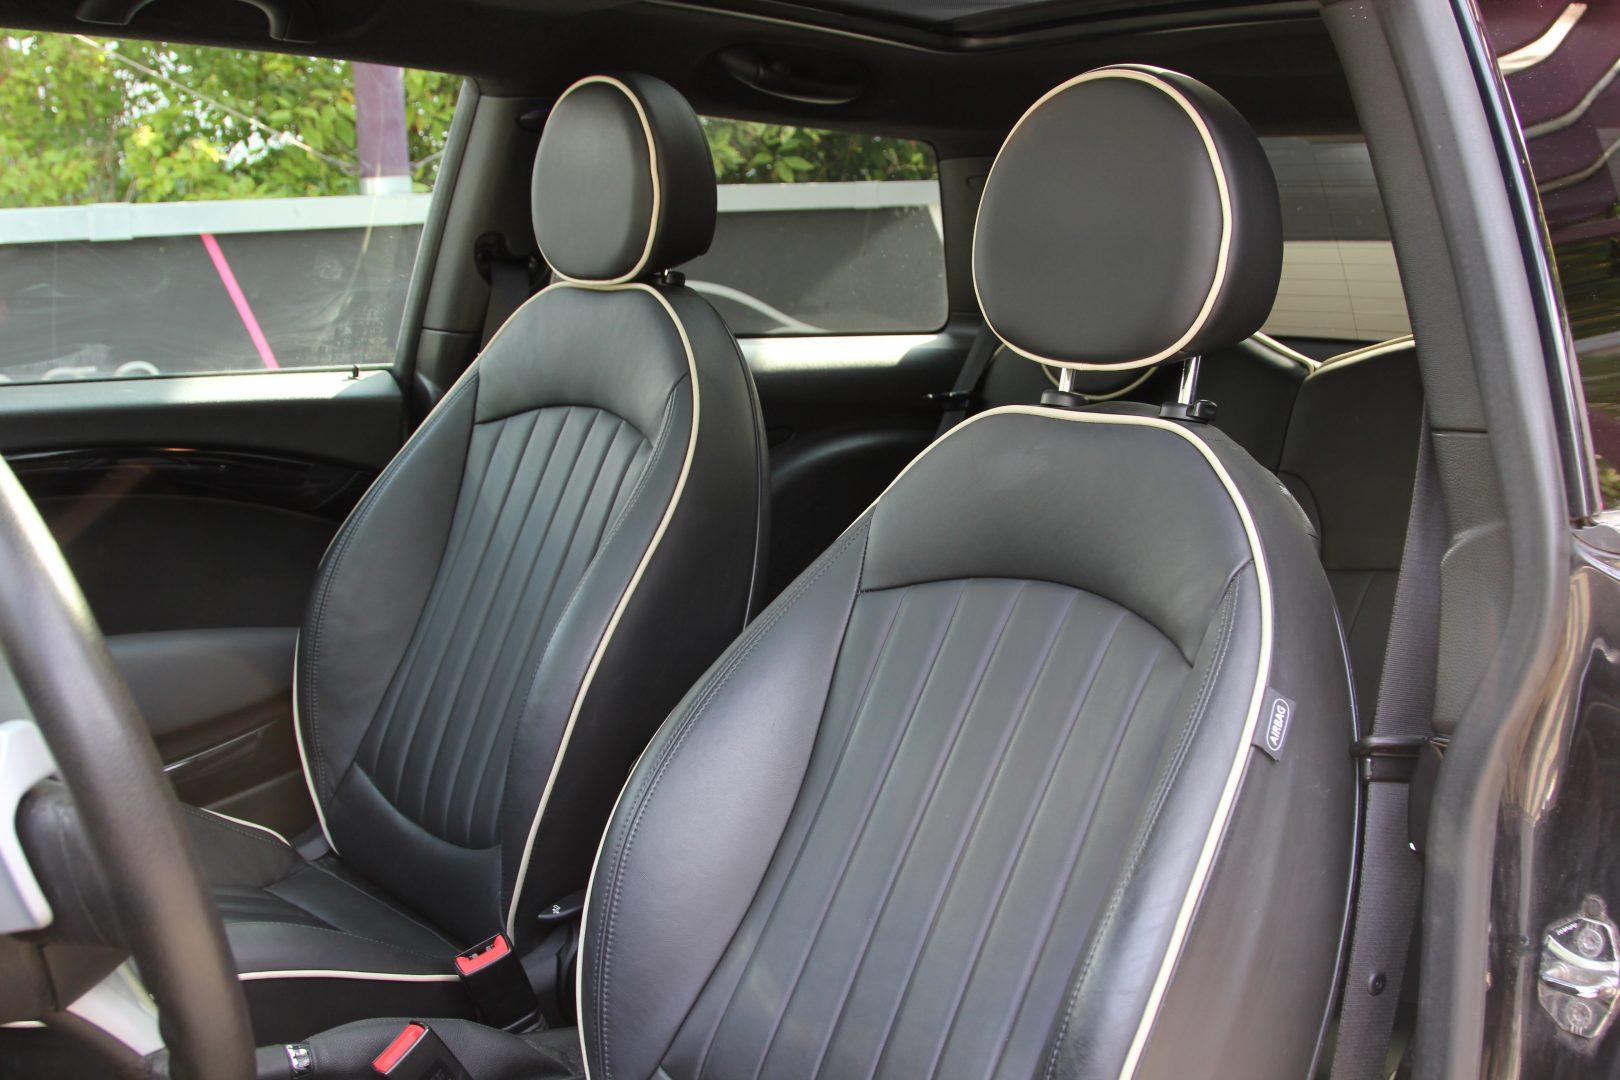 AIL MINI MINI Cooper S 1